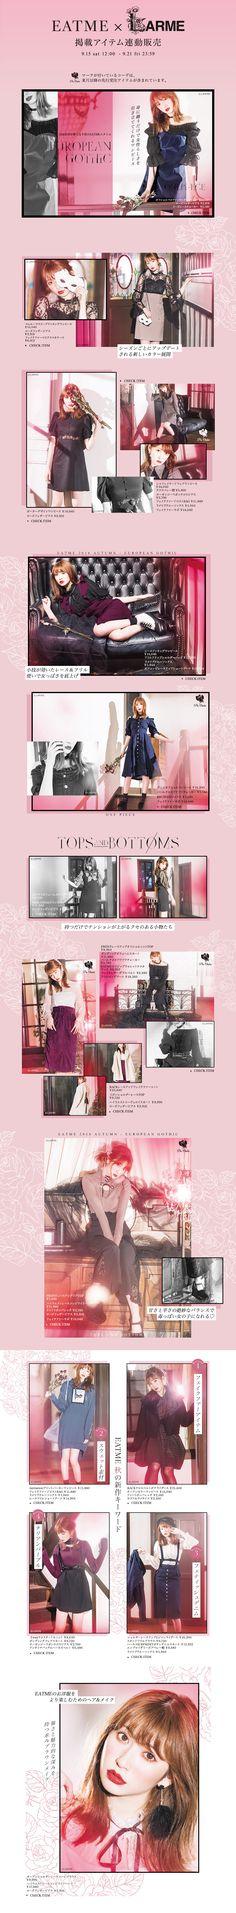 Fashion Web Design, Layout, Fasion, Cute, Catalog, Style, Swag, Page Layout, Stylus